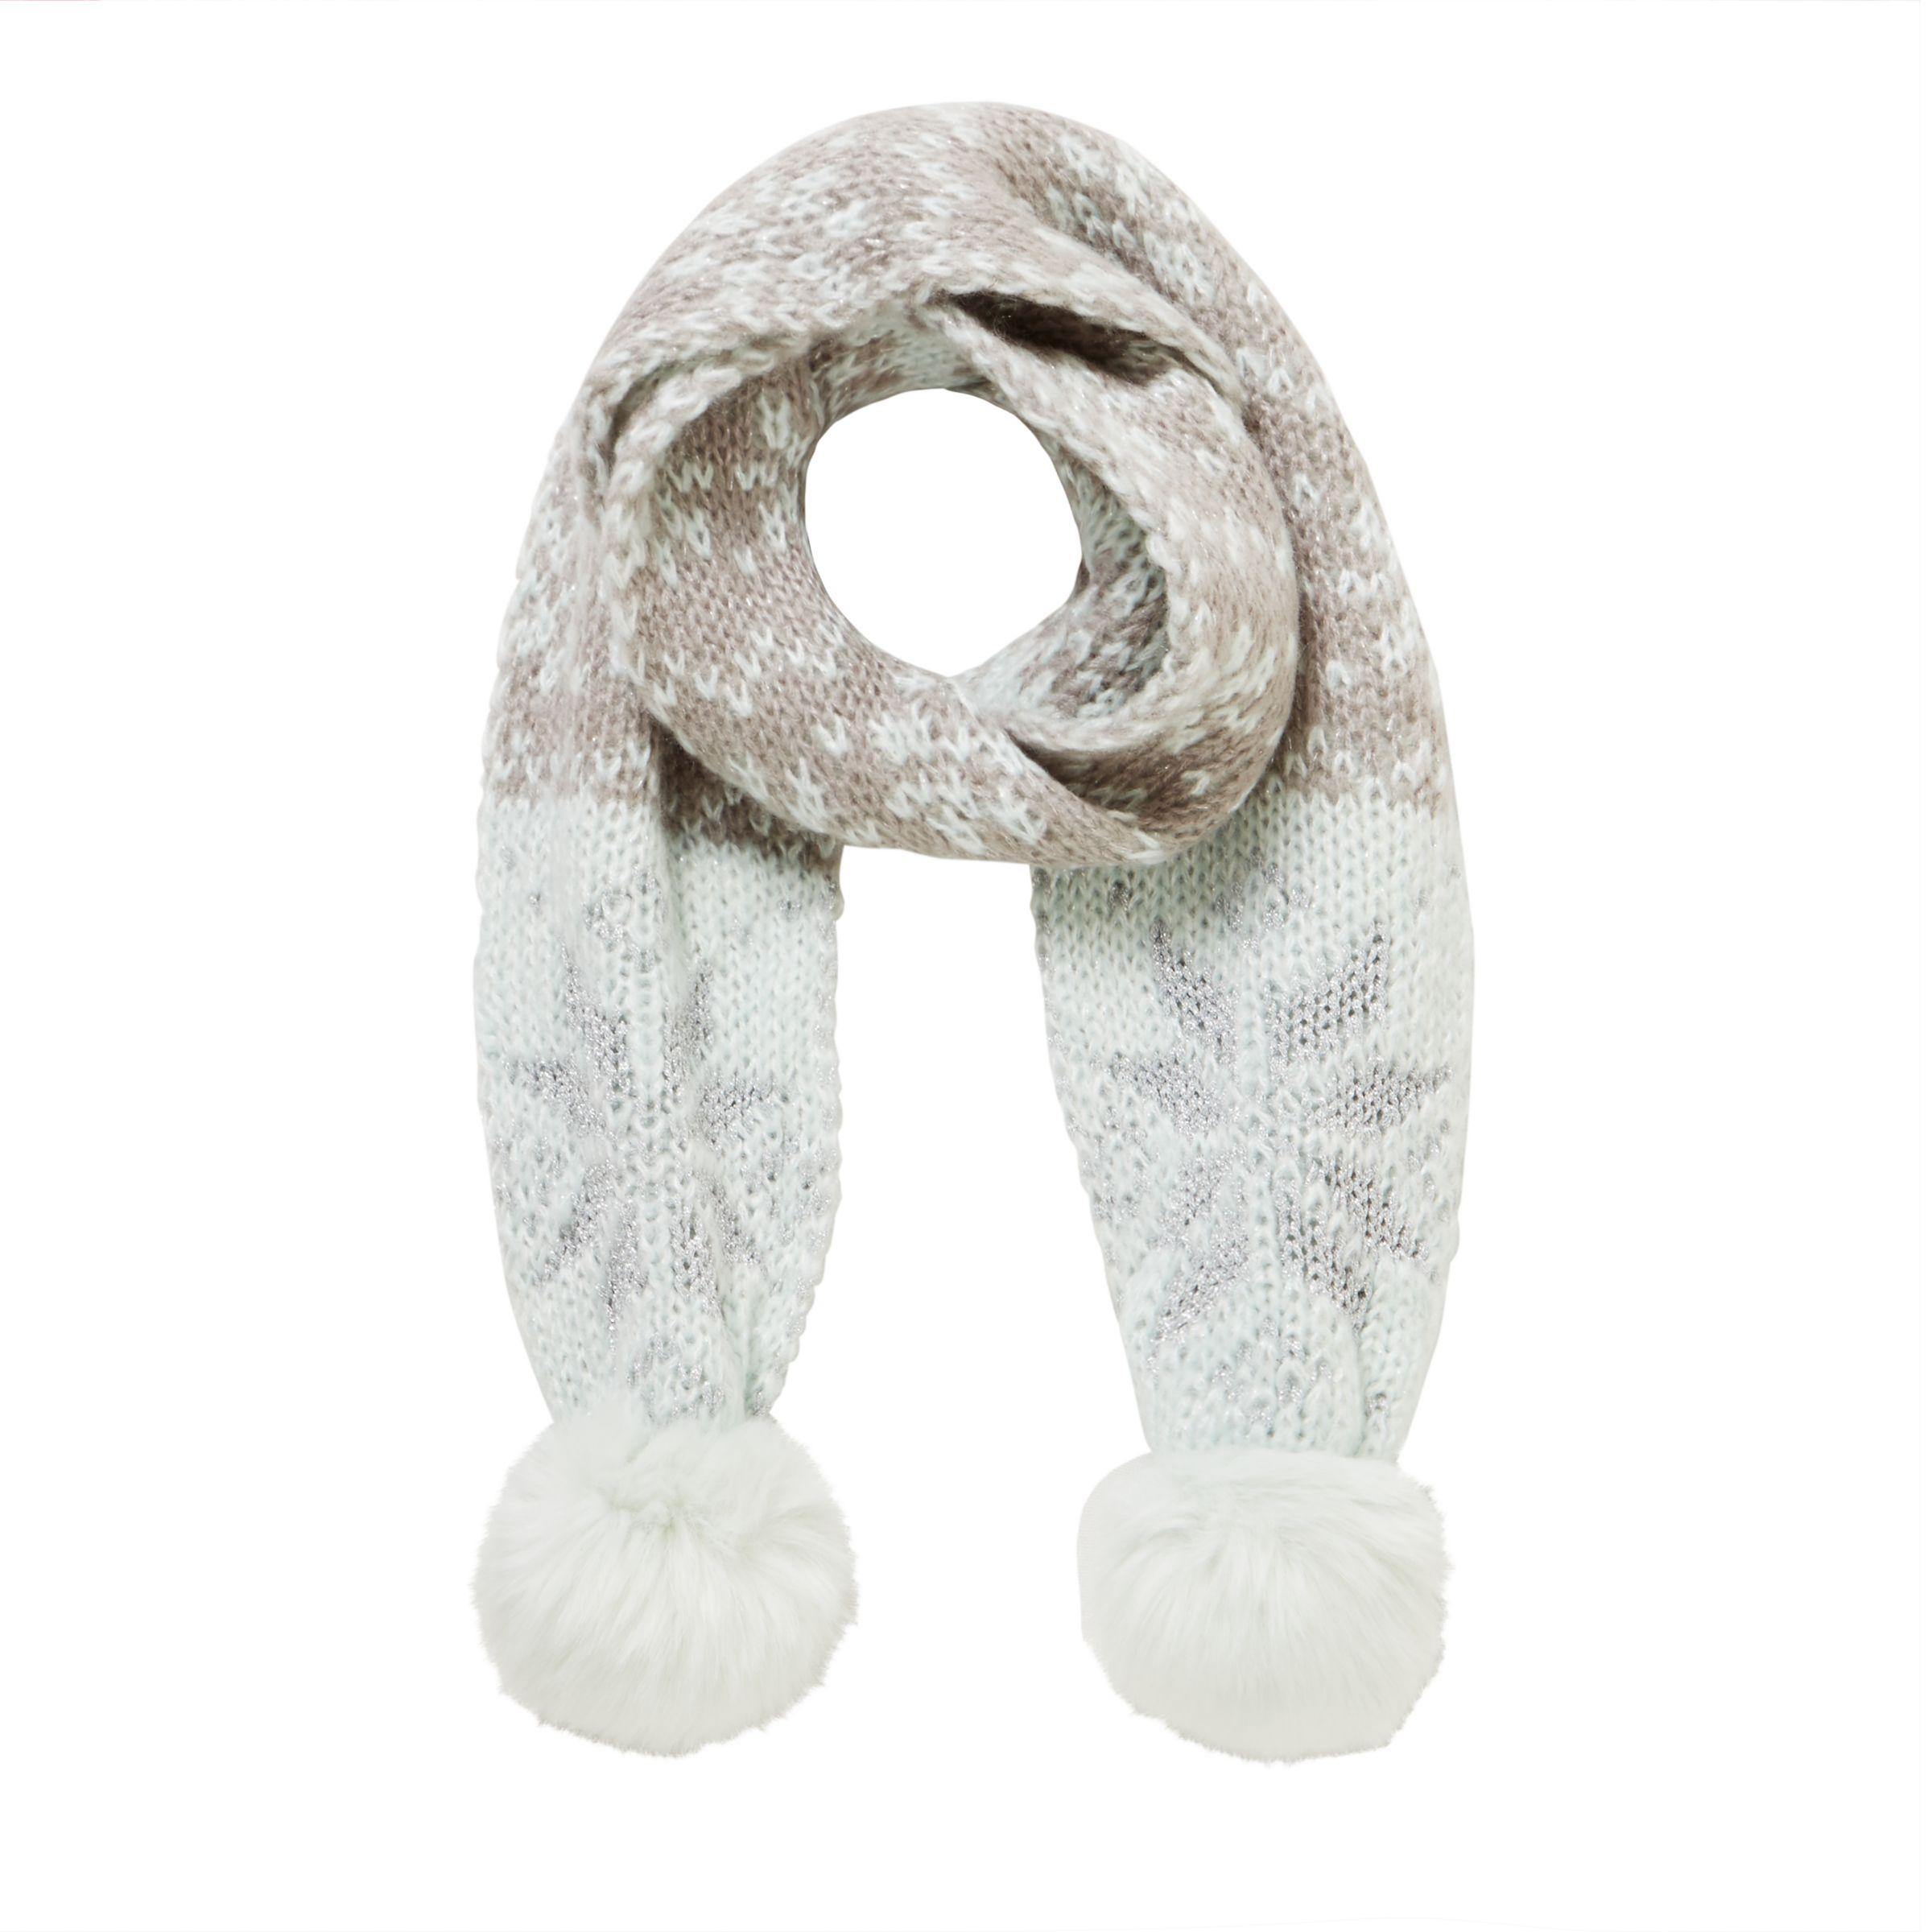 Girls Knitted Hats, Scarves & Gloves John Lewis